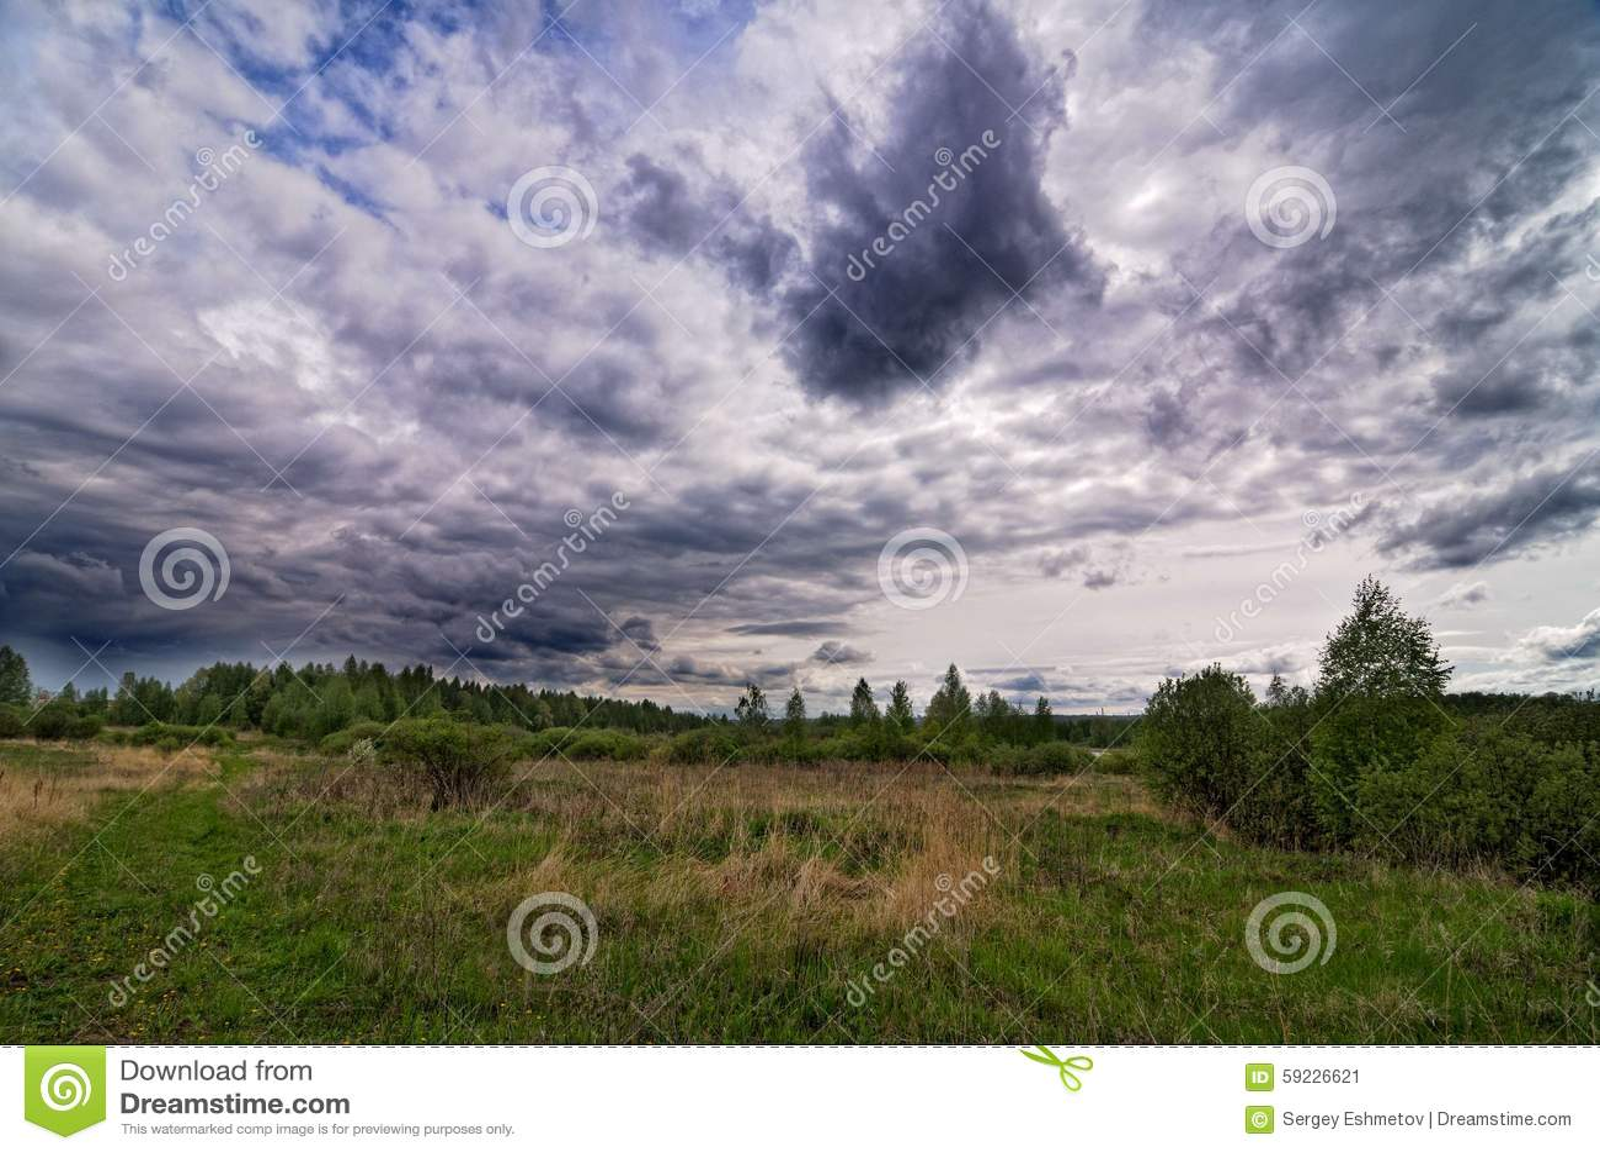 Download Paisaje rural imagen de archivo. Imagen de cambiante - 59226621